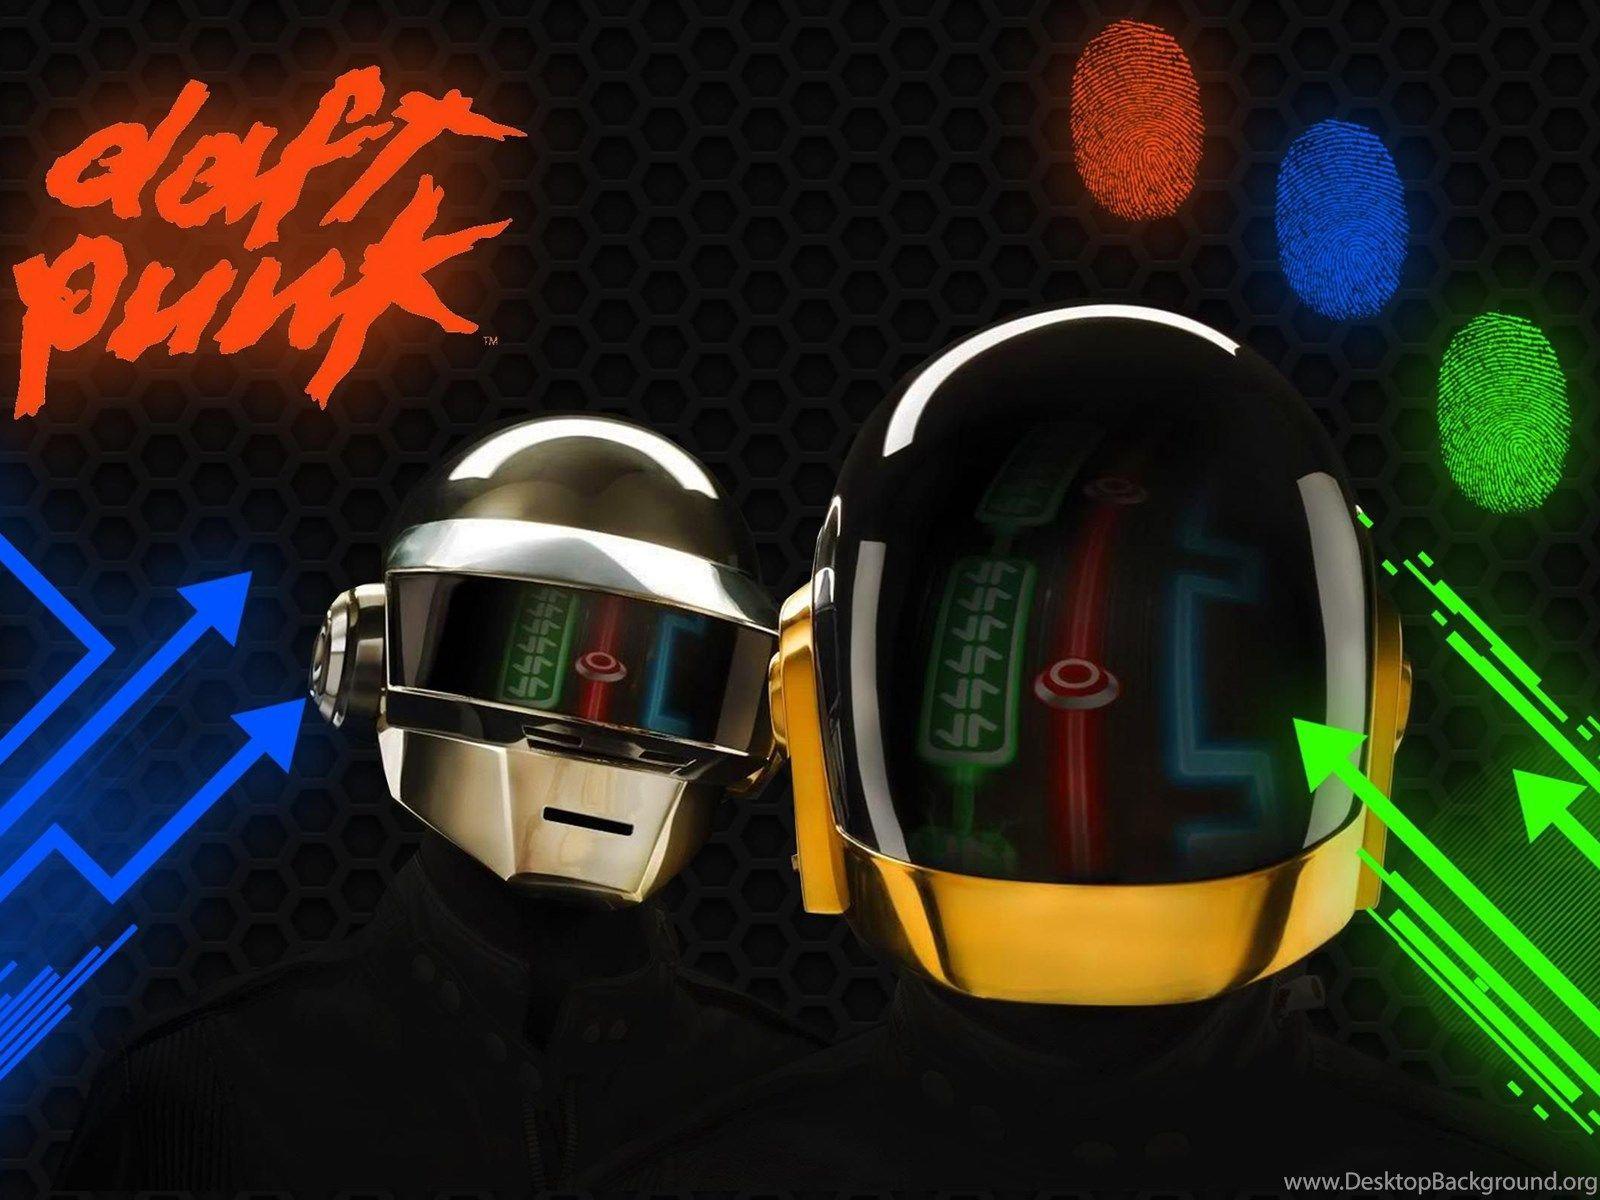 Daft Punk Wallpapers - Top Free Daft Punk Backgrounds ...